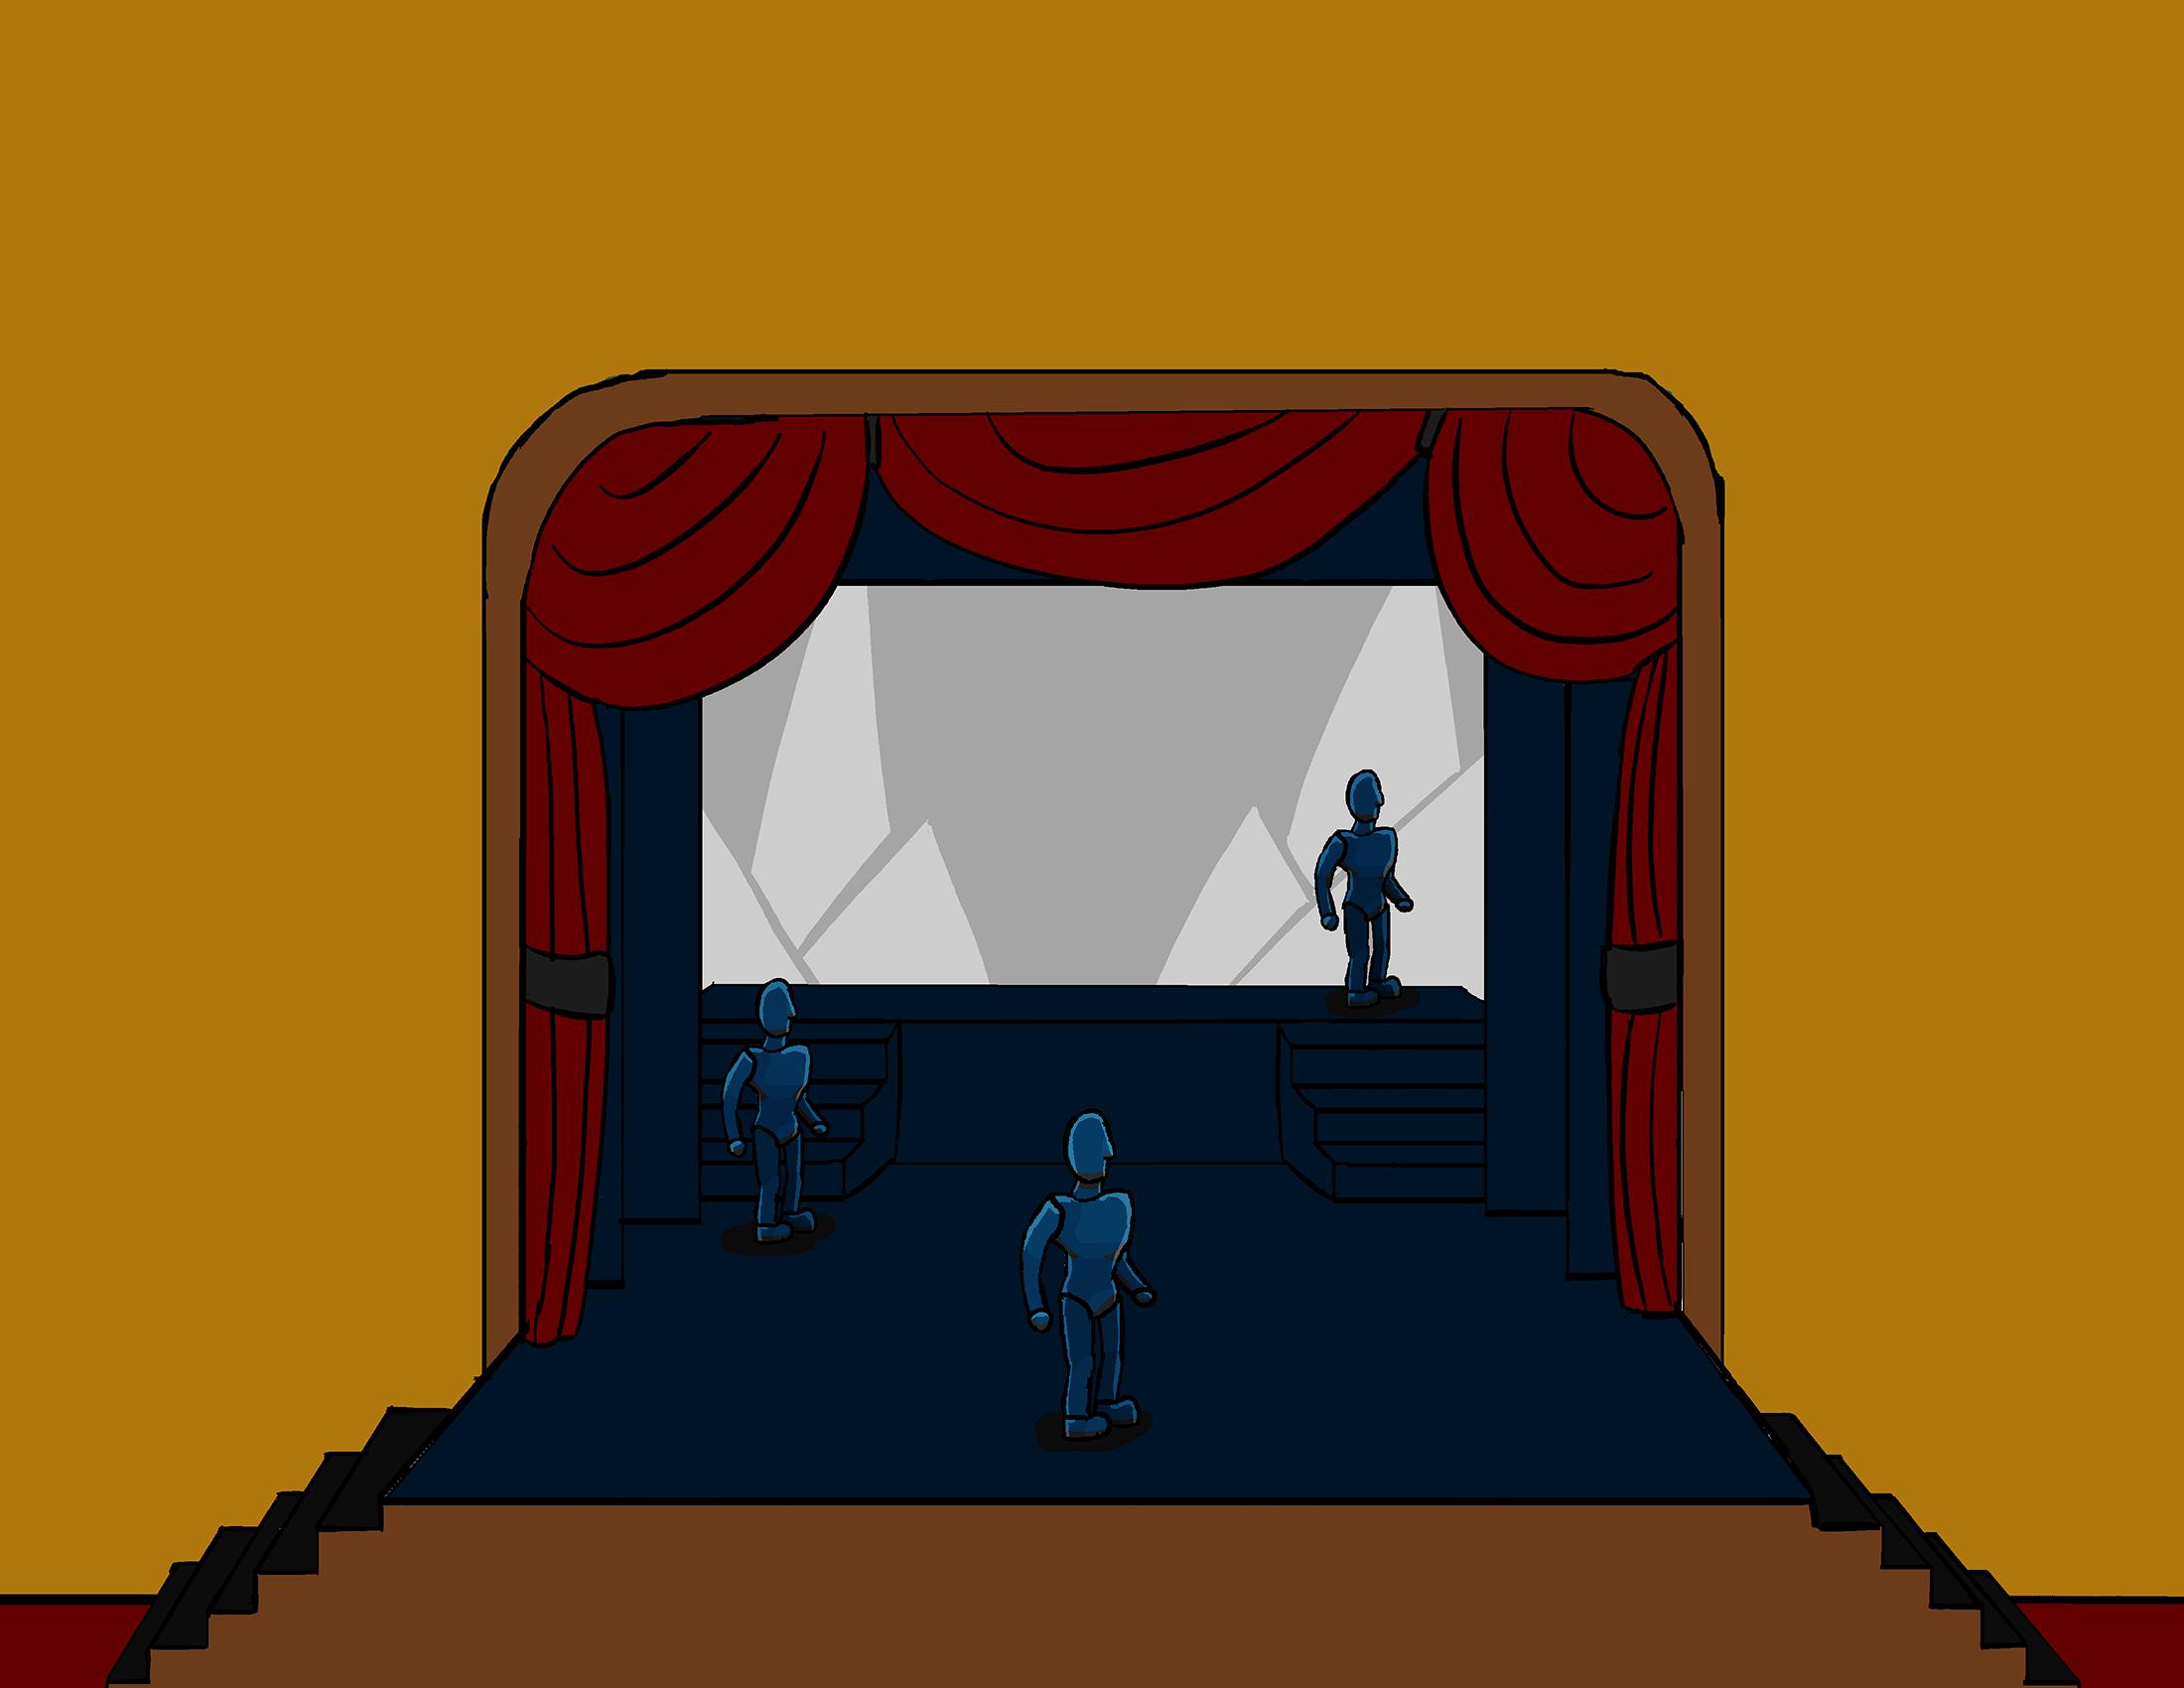 Storyboard - Opening